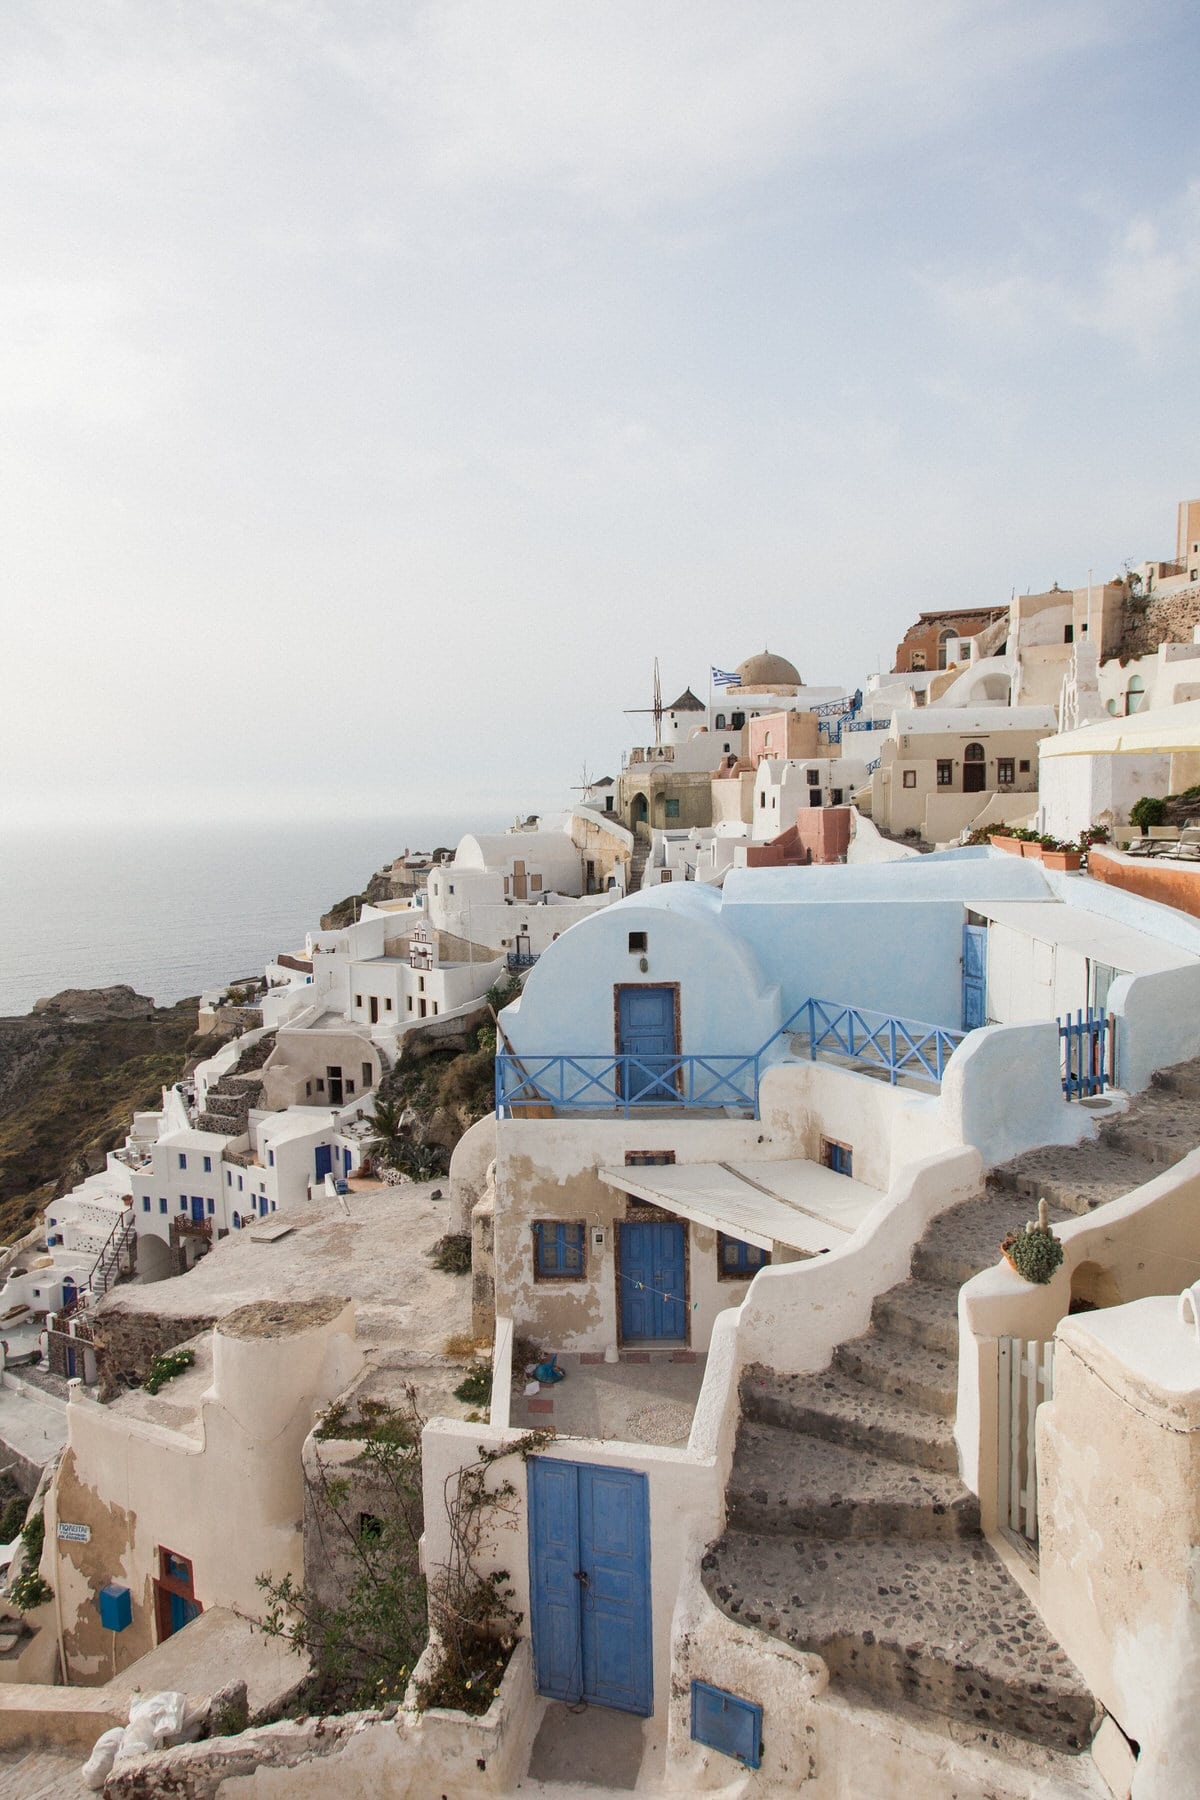 Santorini-Greece-black-and-white-fine-art-photography-by-Studio-L-photographer-Laura-Schneider-_2925